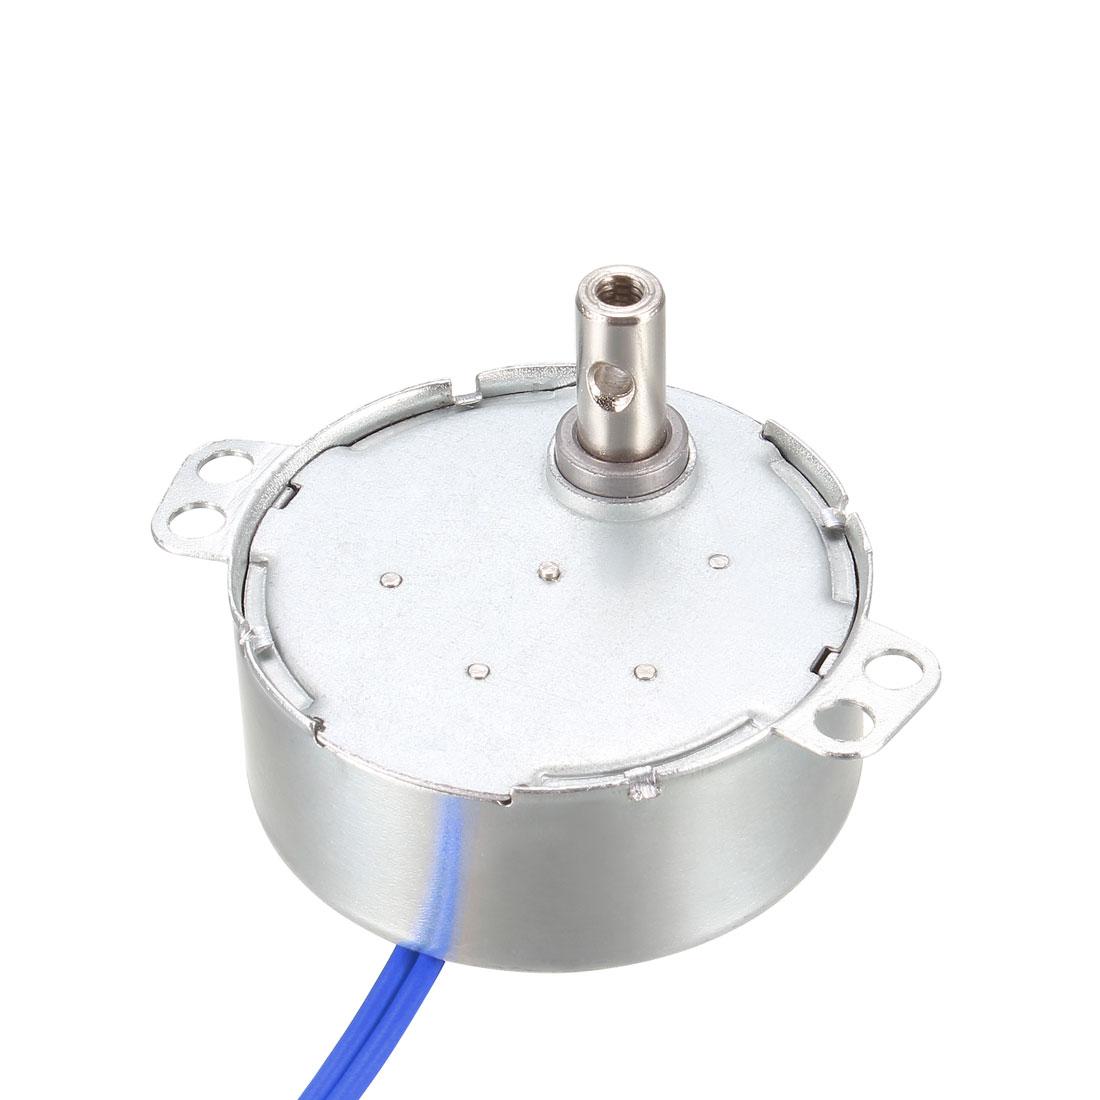 Electric Synchronous Synchron Motor Motor 100-127 VAC 50-60Hz CW 4W 2-2.4RPM